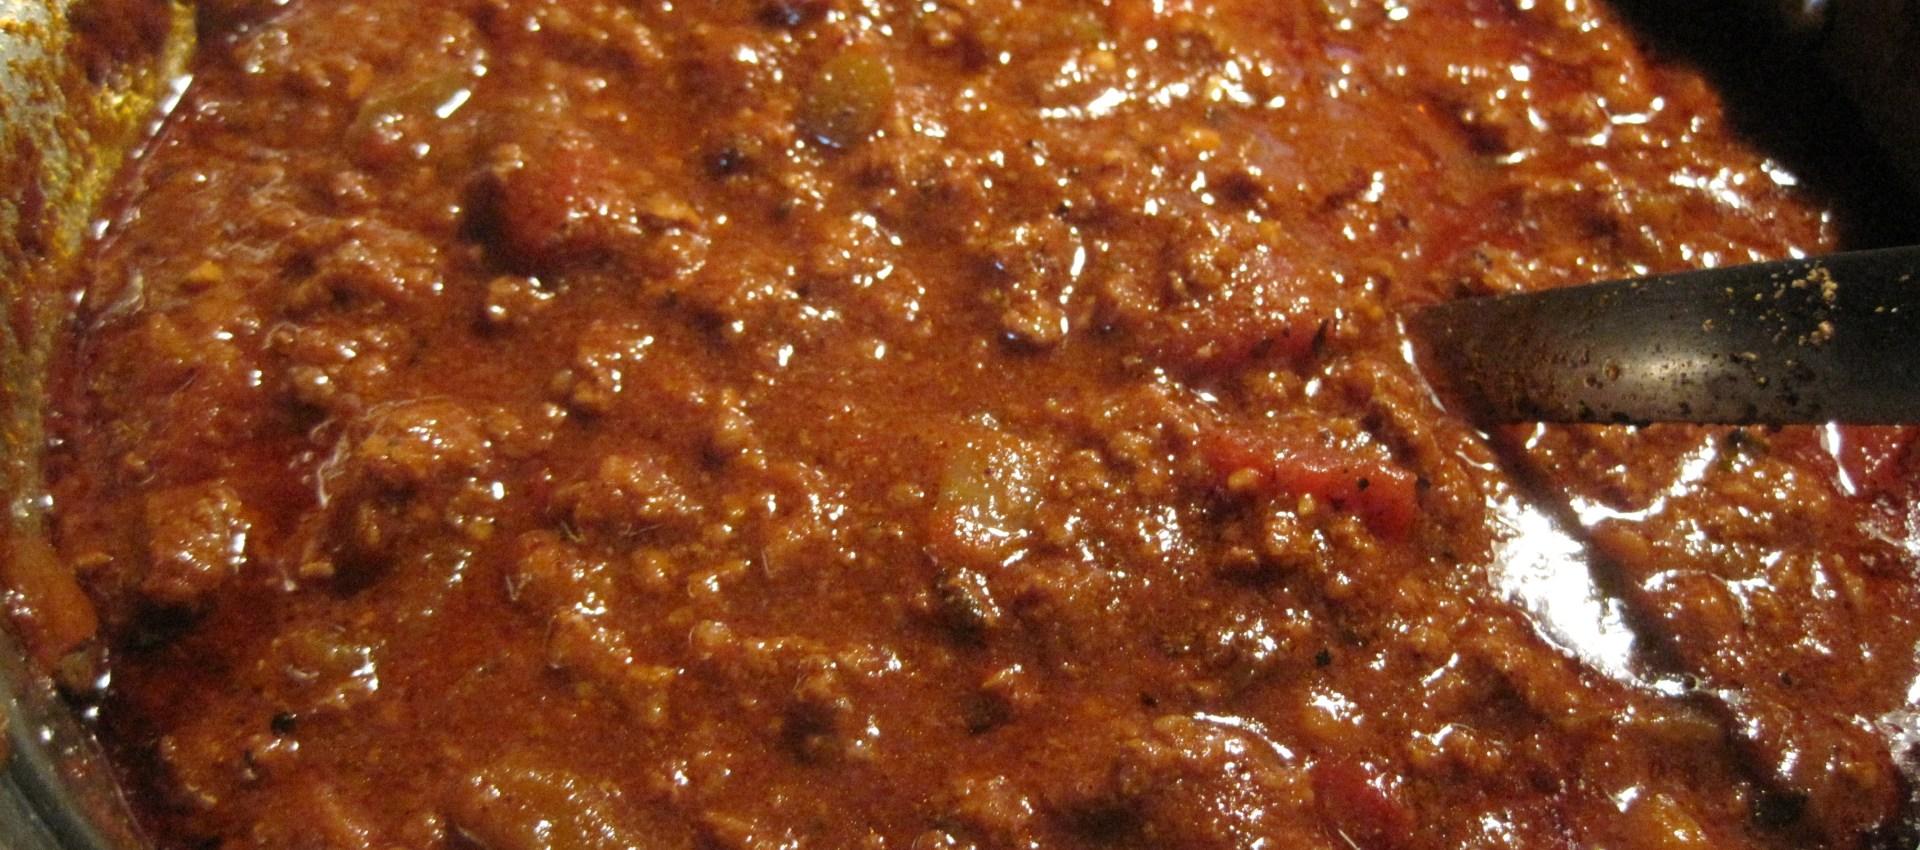 Hcg Diet Recipe for Chili